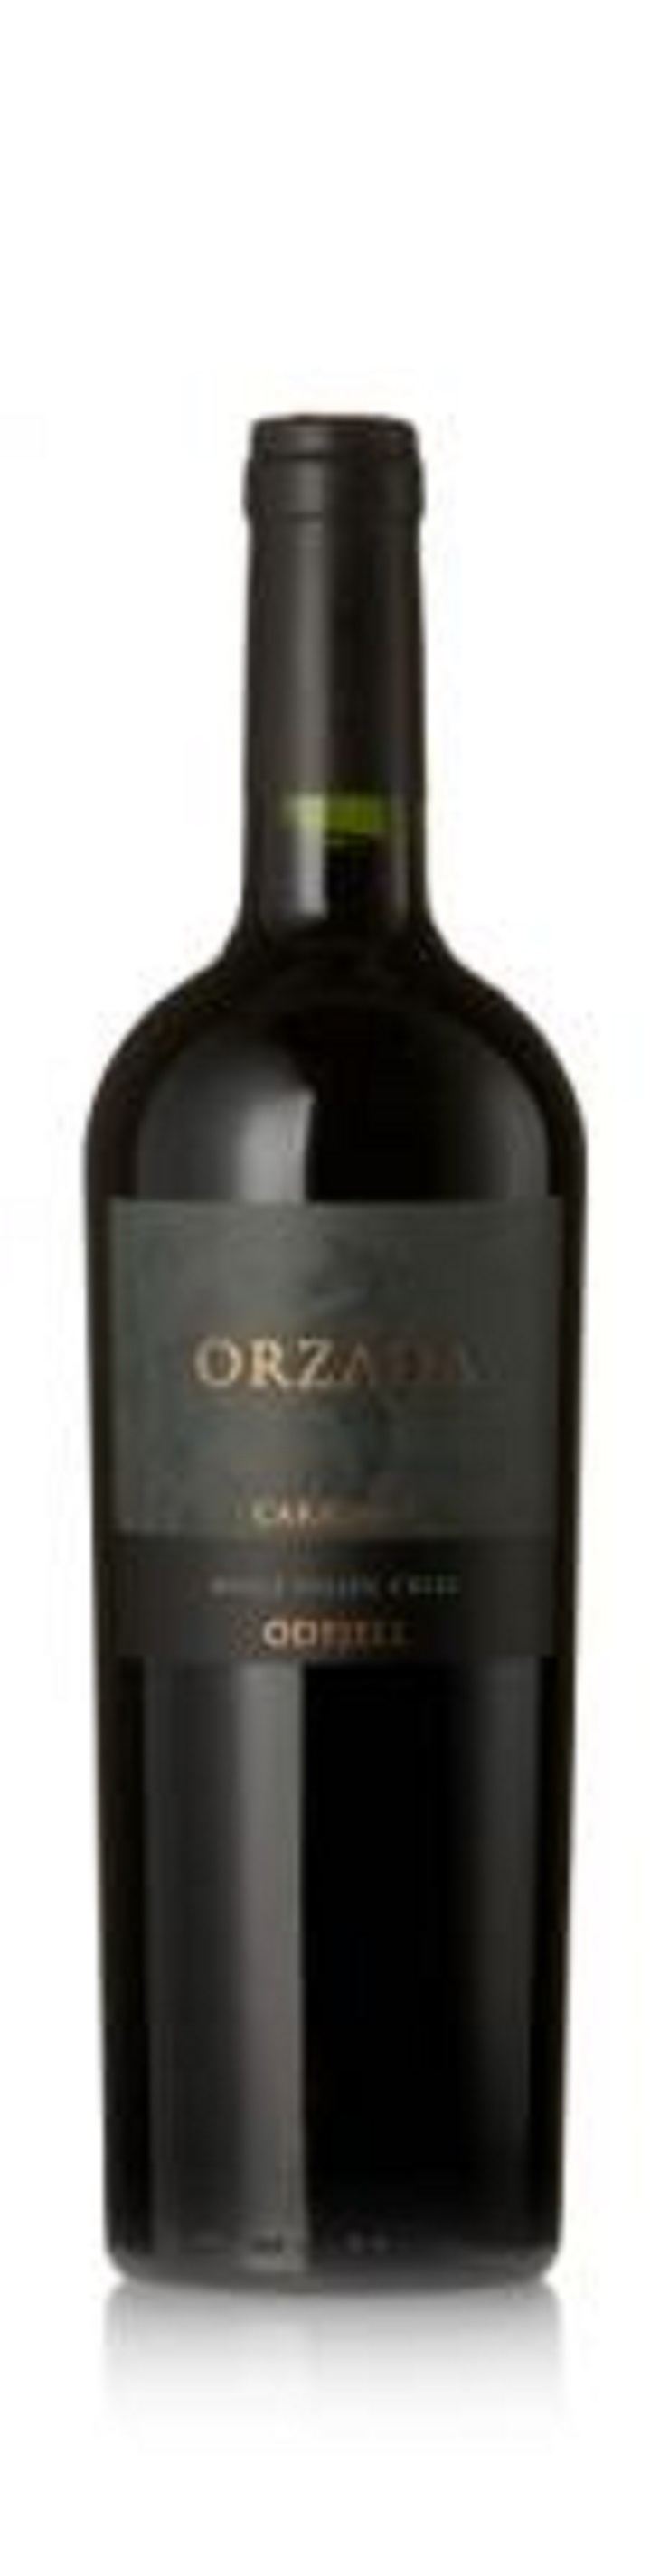 Odfjell Orzada Carignan